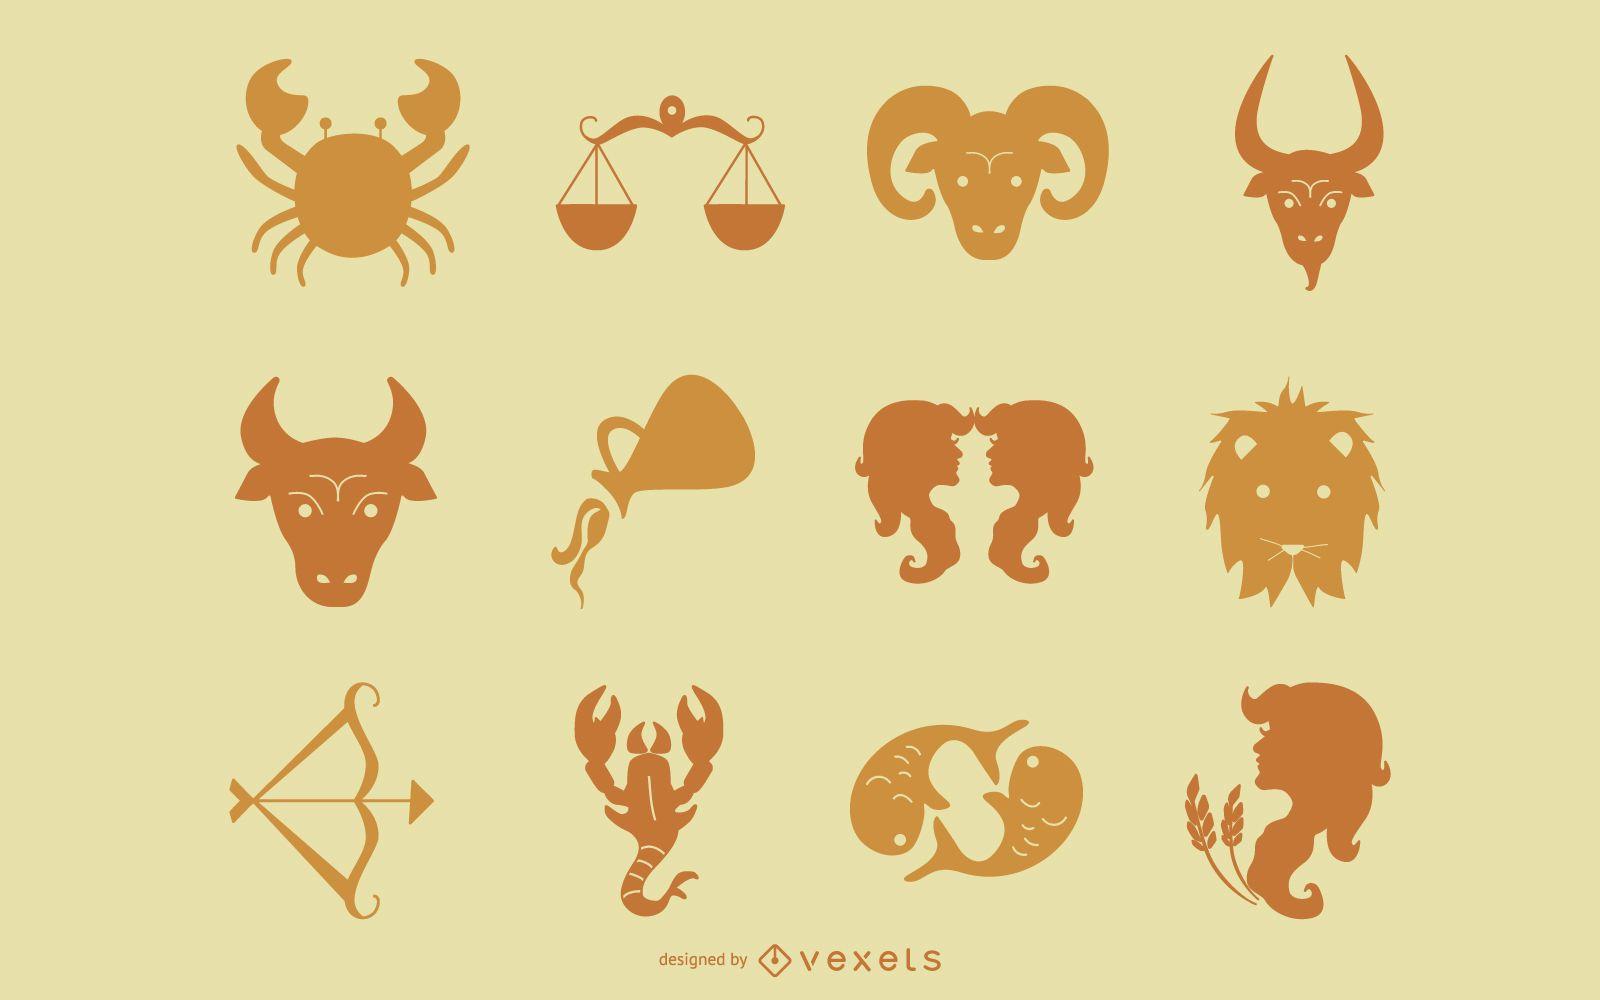 Colección de signos del zodiaco horóscopo